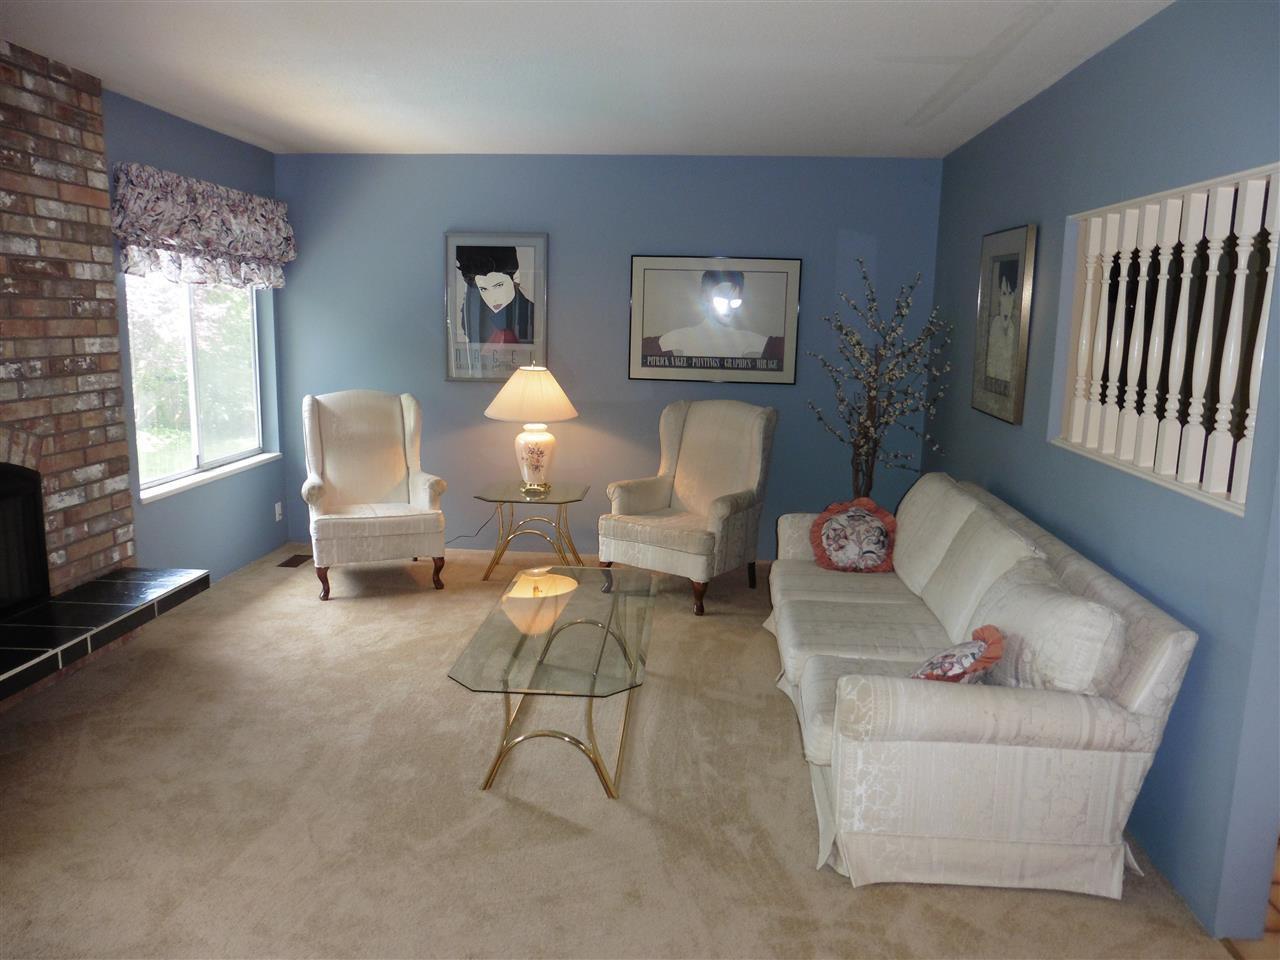 "Photo 3: Photos: 6683 STONEY Crescent in Delta: Sunshine Hills Woods House for sale in ""SUNSHINE HILLS"" (N. Delta)  : MLS®# R2470318"